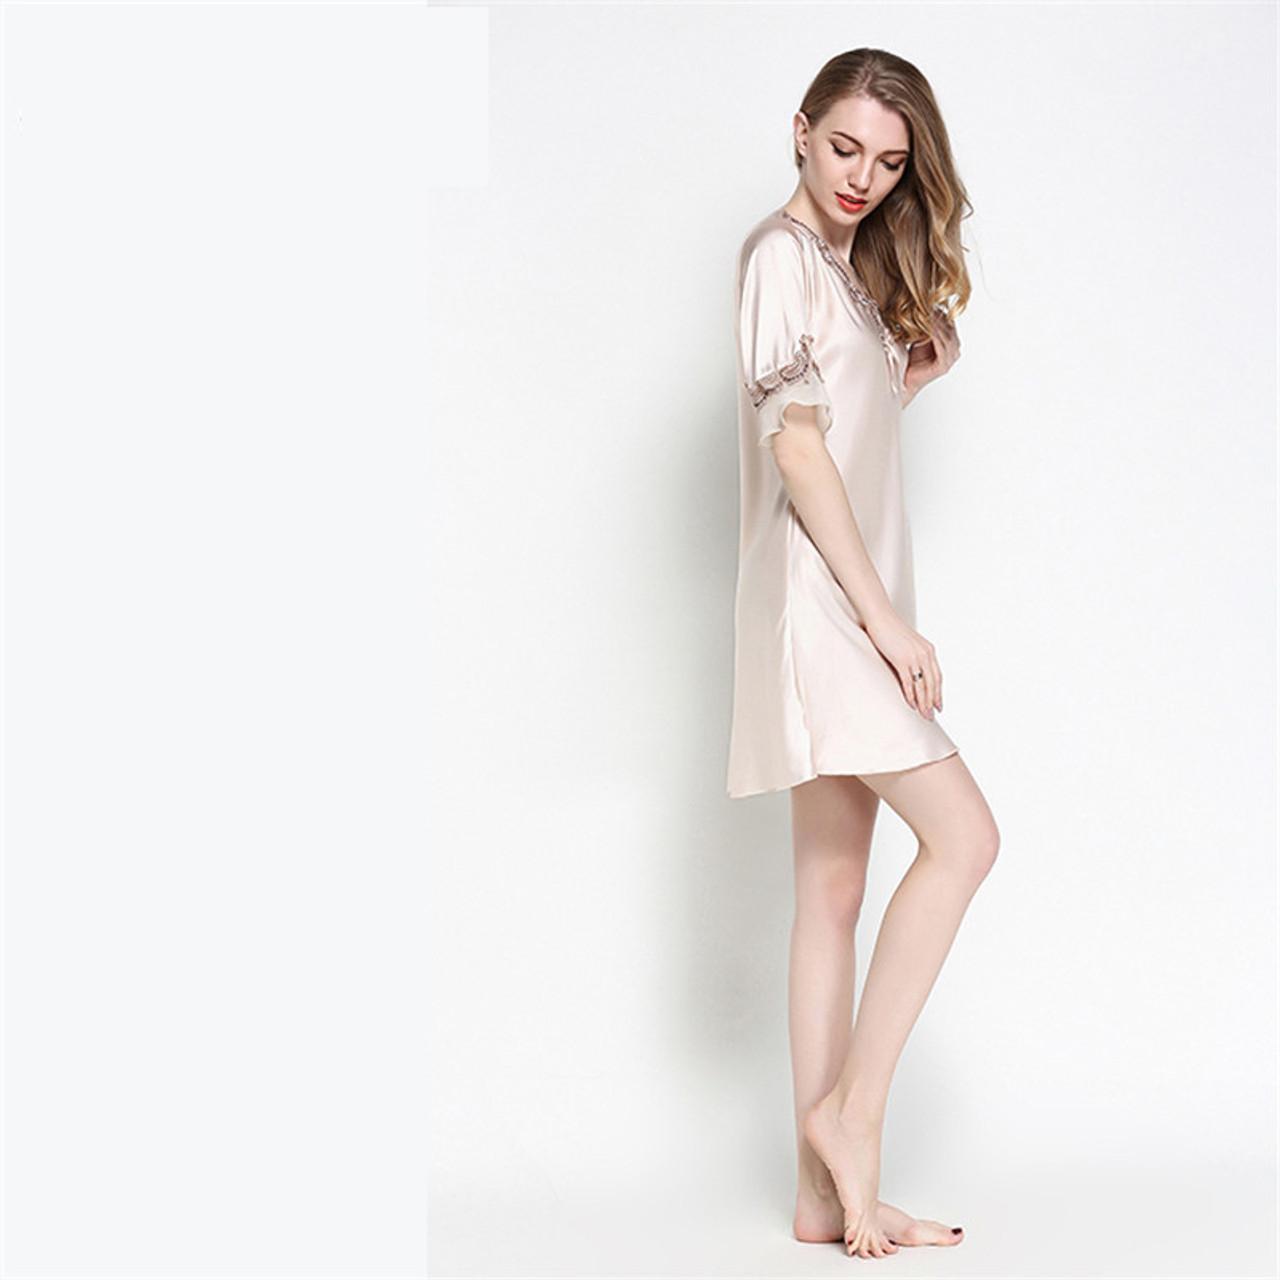 2d231c7d351 ... Women Silk Satin Nightgown Short Sleeve Sleepshirt V-neck Night Shirt  Elegant Night Dress Lace ...